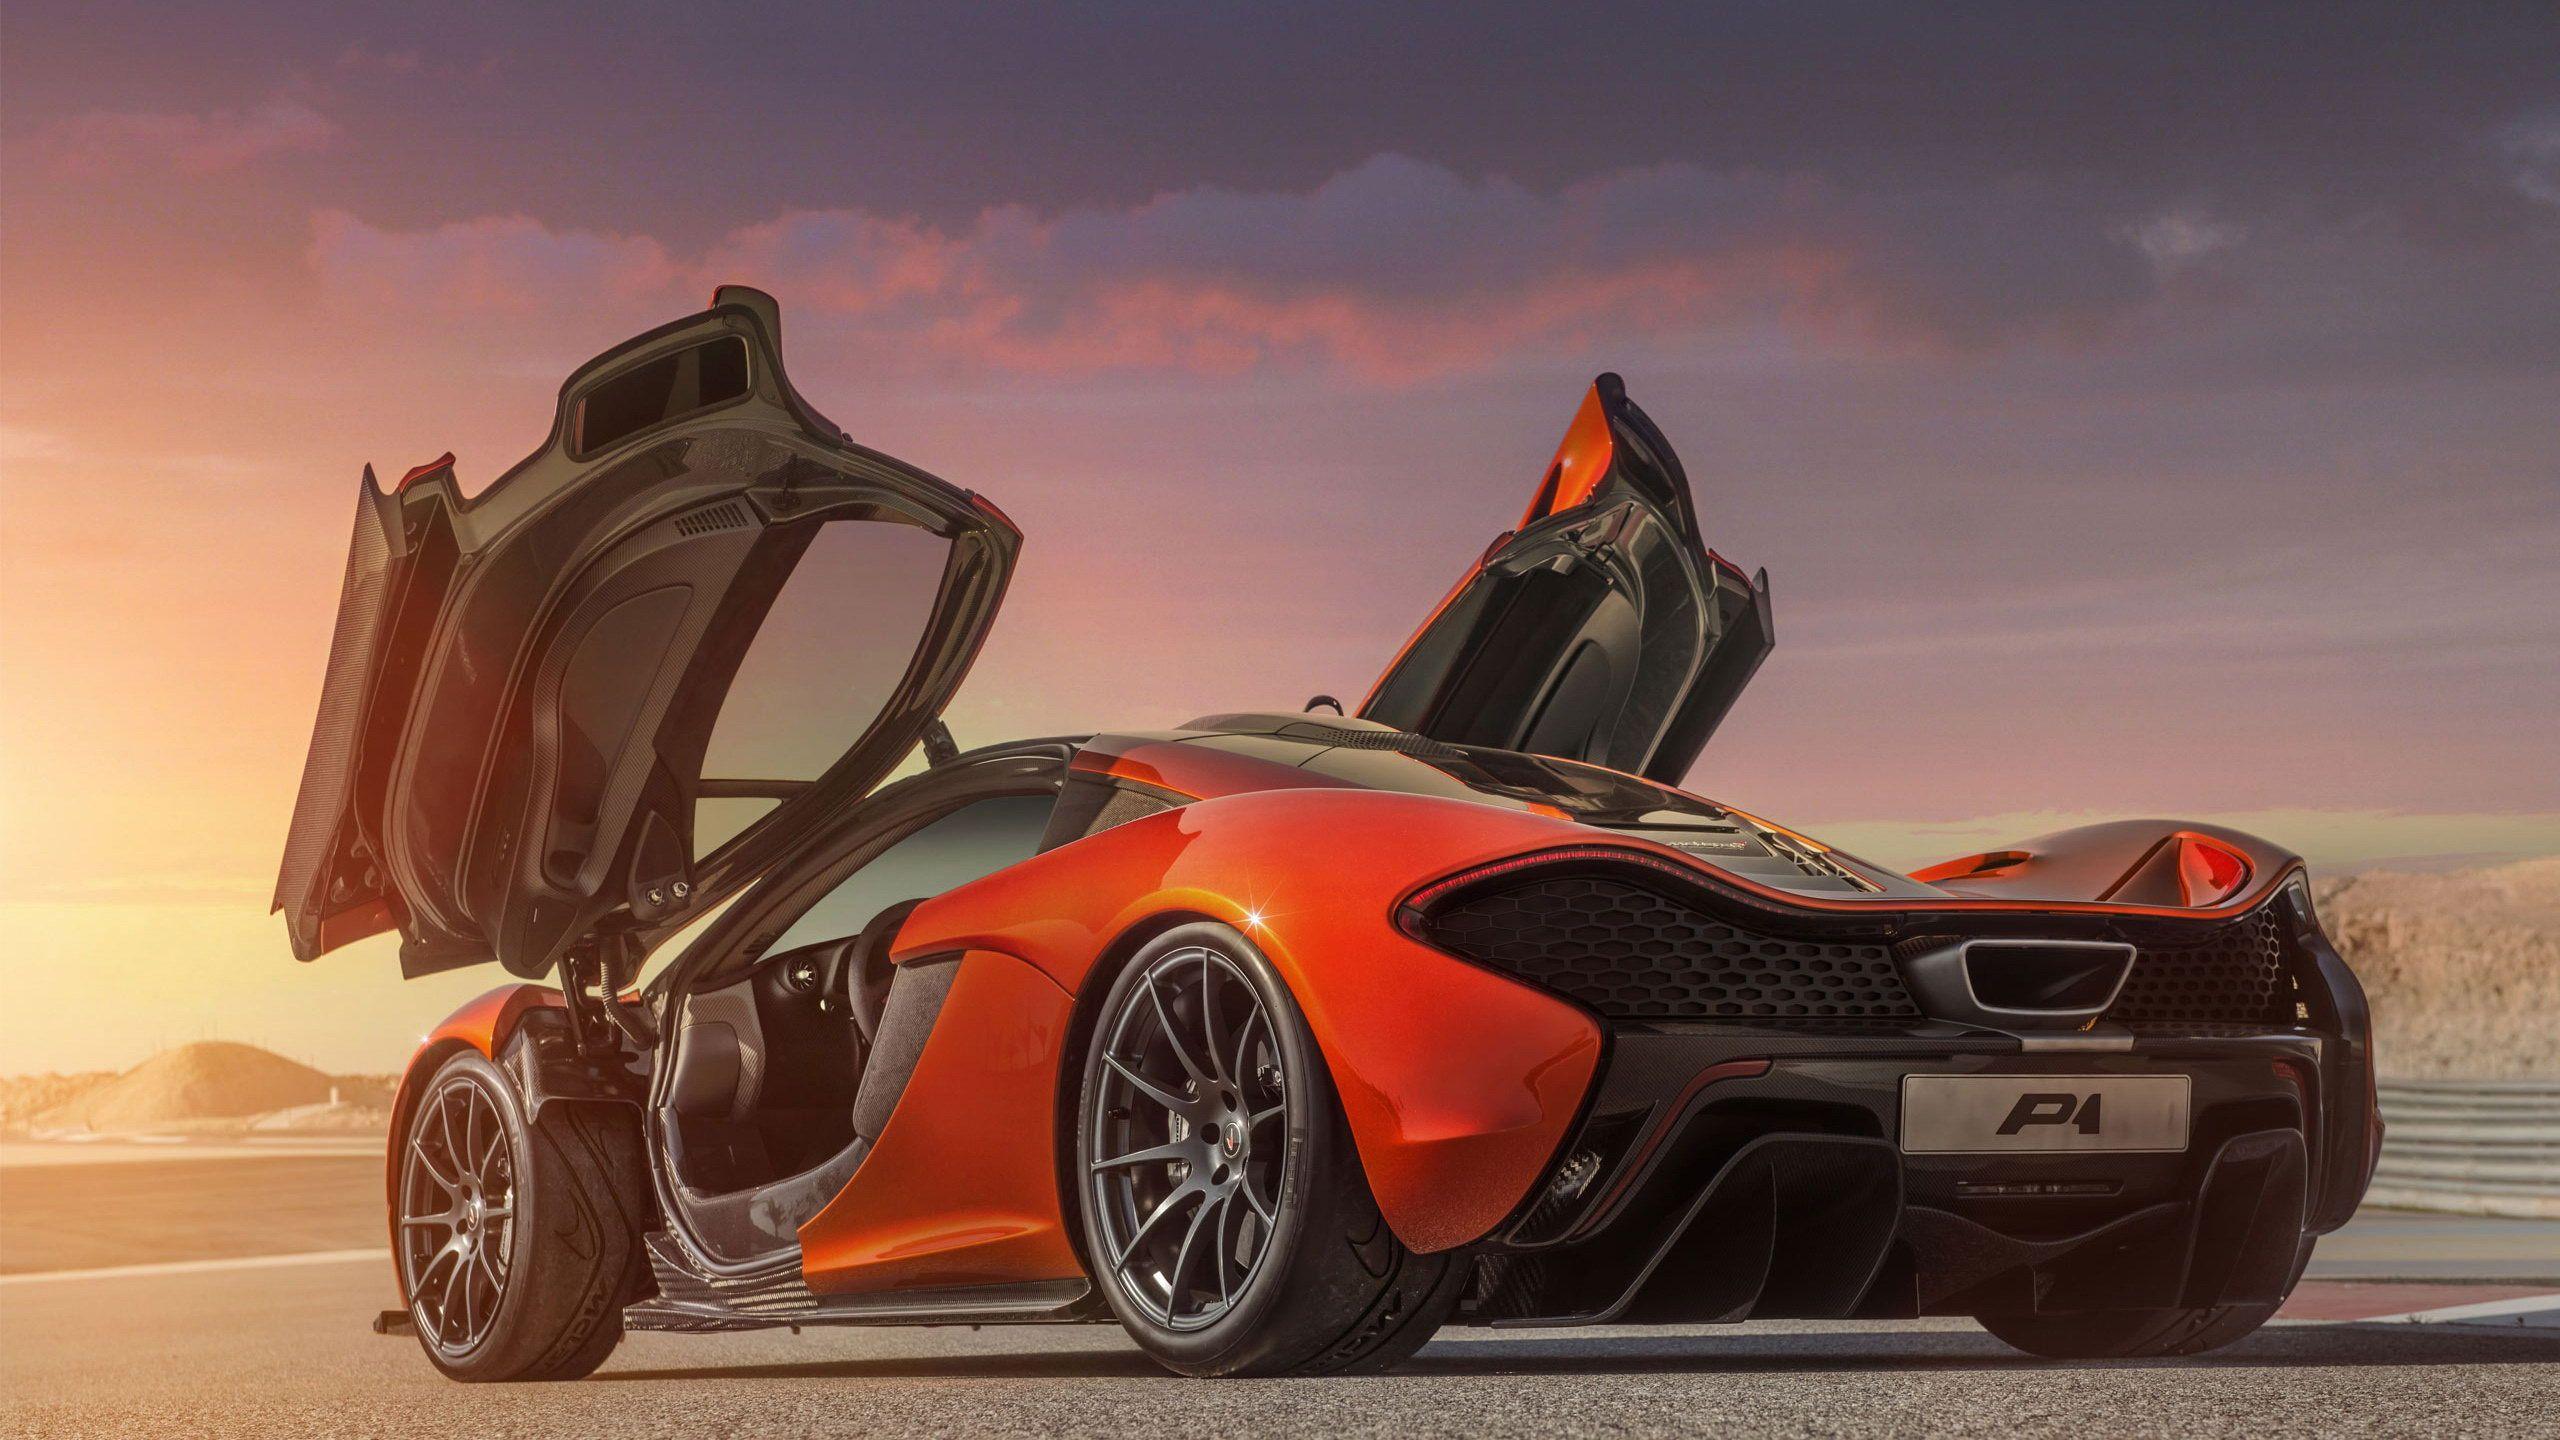 Exceptional McLaren P1 Neon Energy Crystal City Car 2014 | Fast Cars McLaren P1 |  Pinterest | Mclaren P1 And City Car